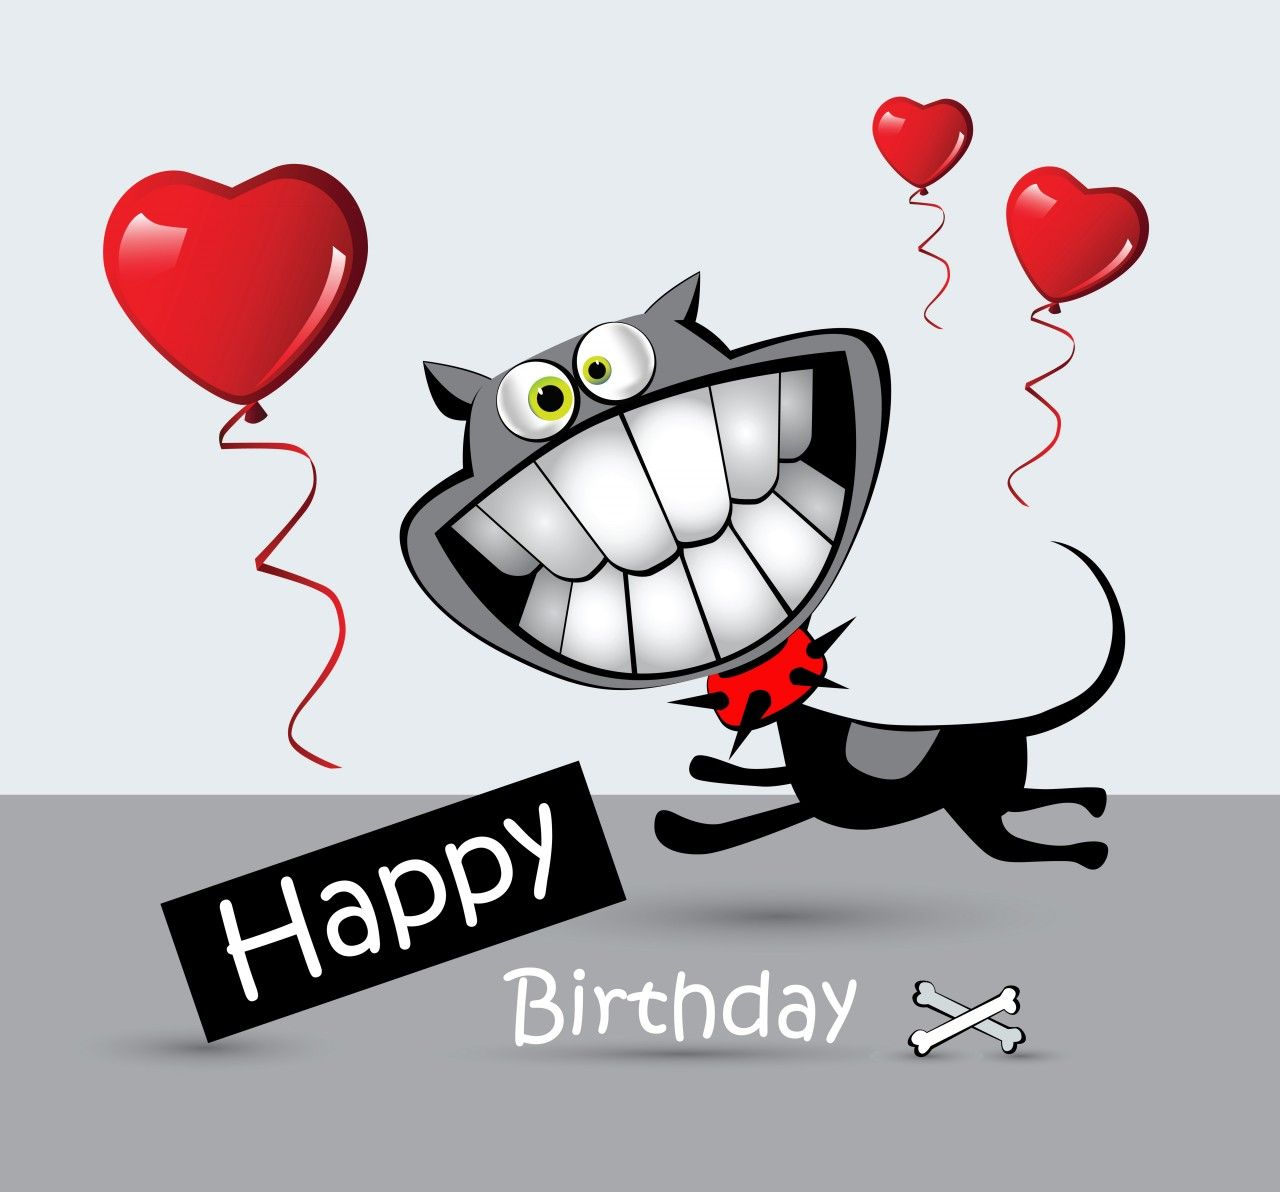 Funny Cartoon Pictures Google Birthday Cartoon Happy Birthday Cartoon Images Happy Birthday Greetings